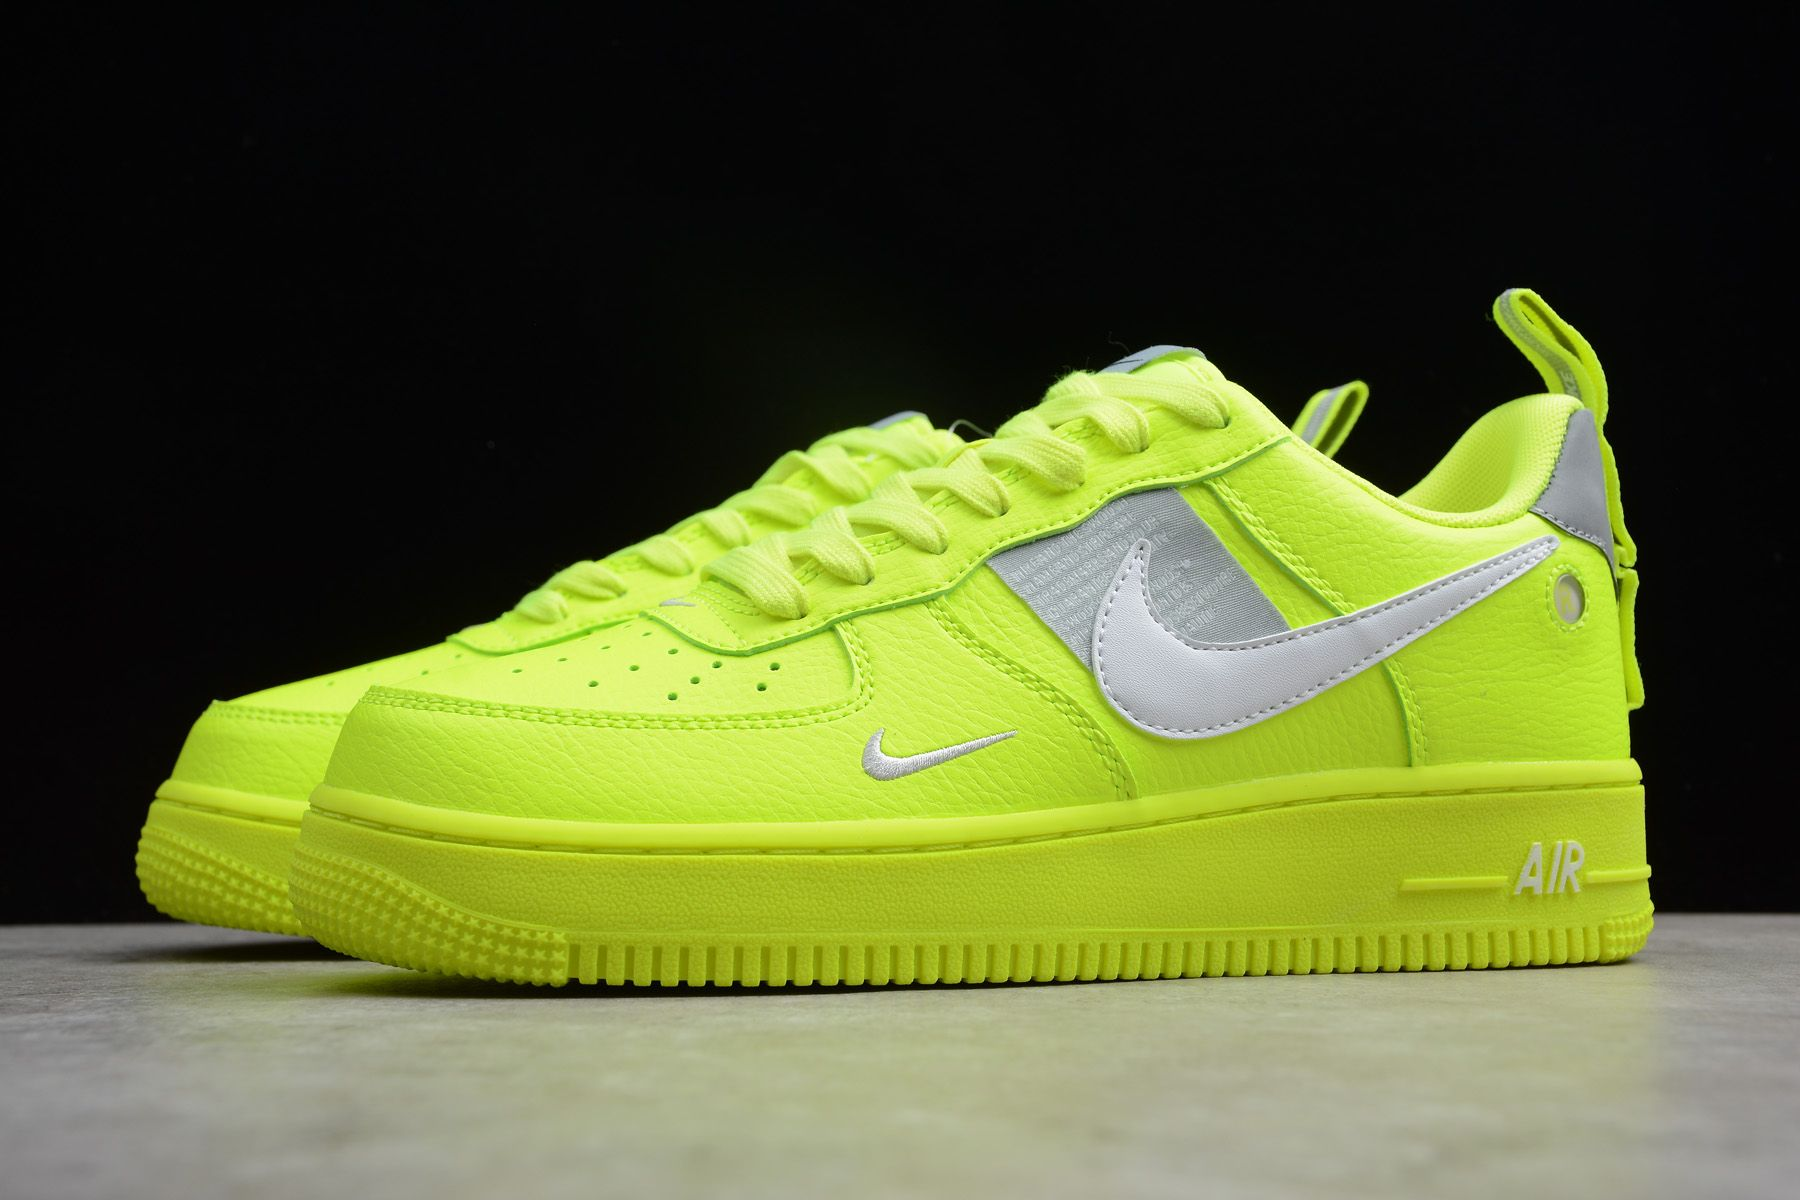 Nike Air Force 1 07 Lv8 Utility Volt Aj7747 700 Sneakers Men Fashion Nike Air Force Nike Air